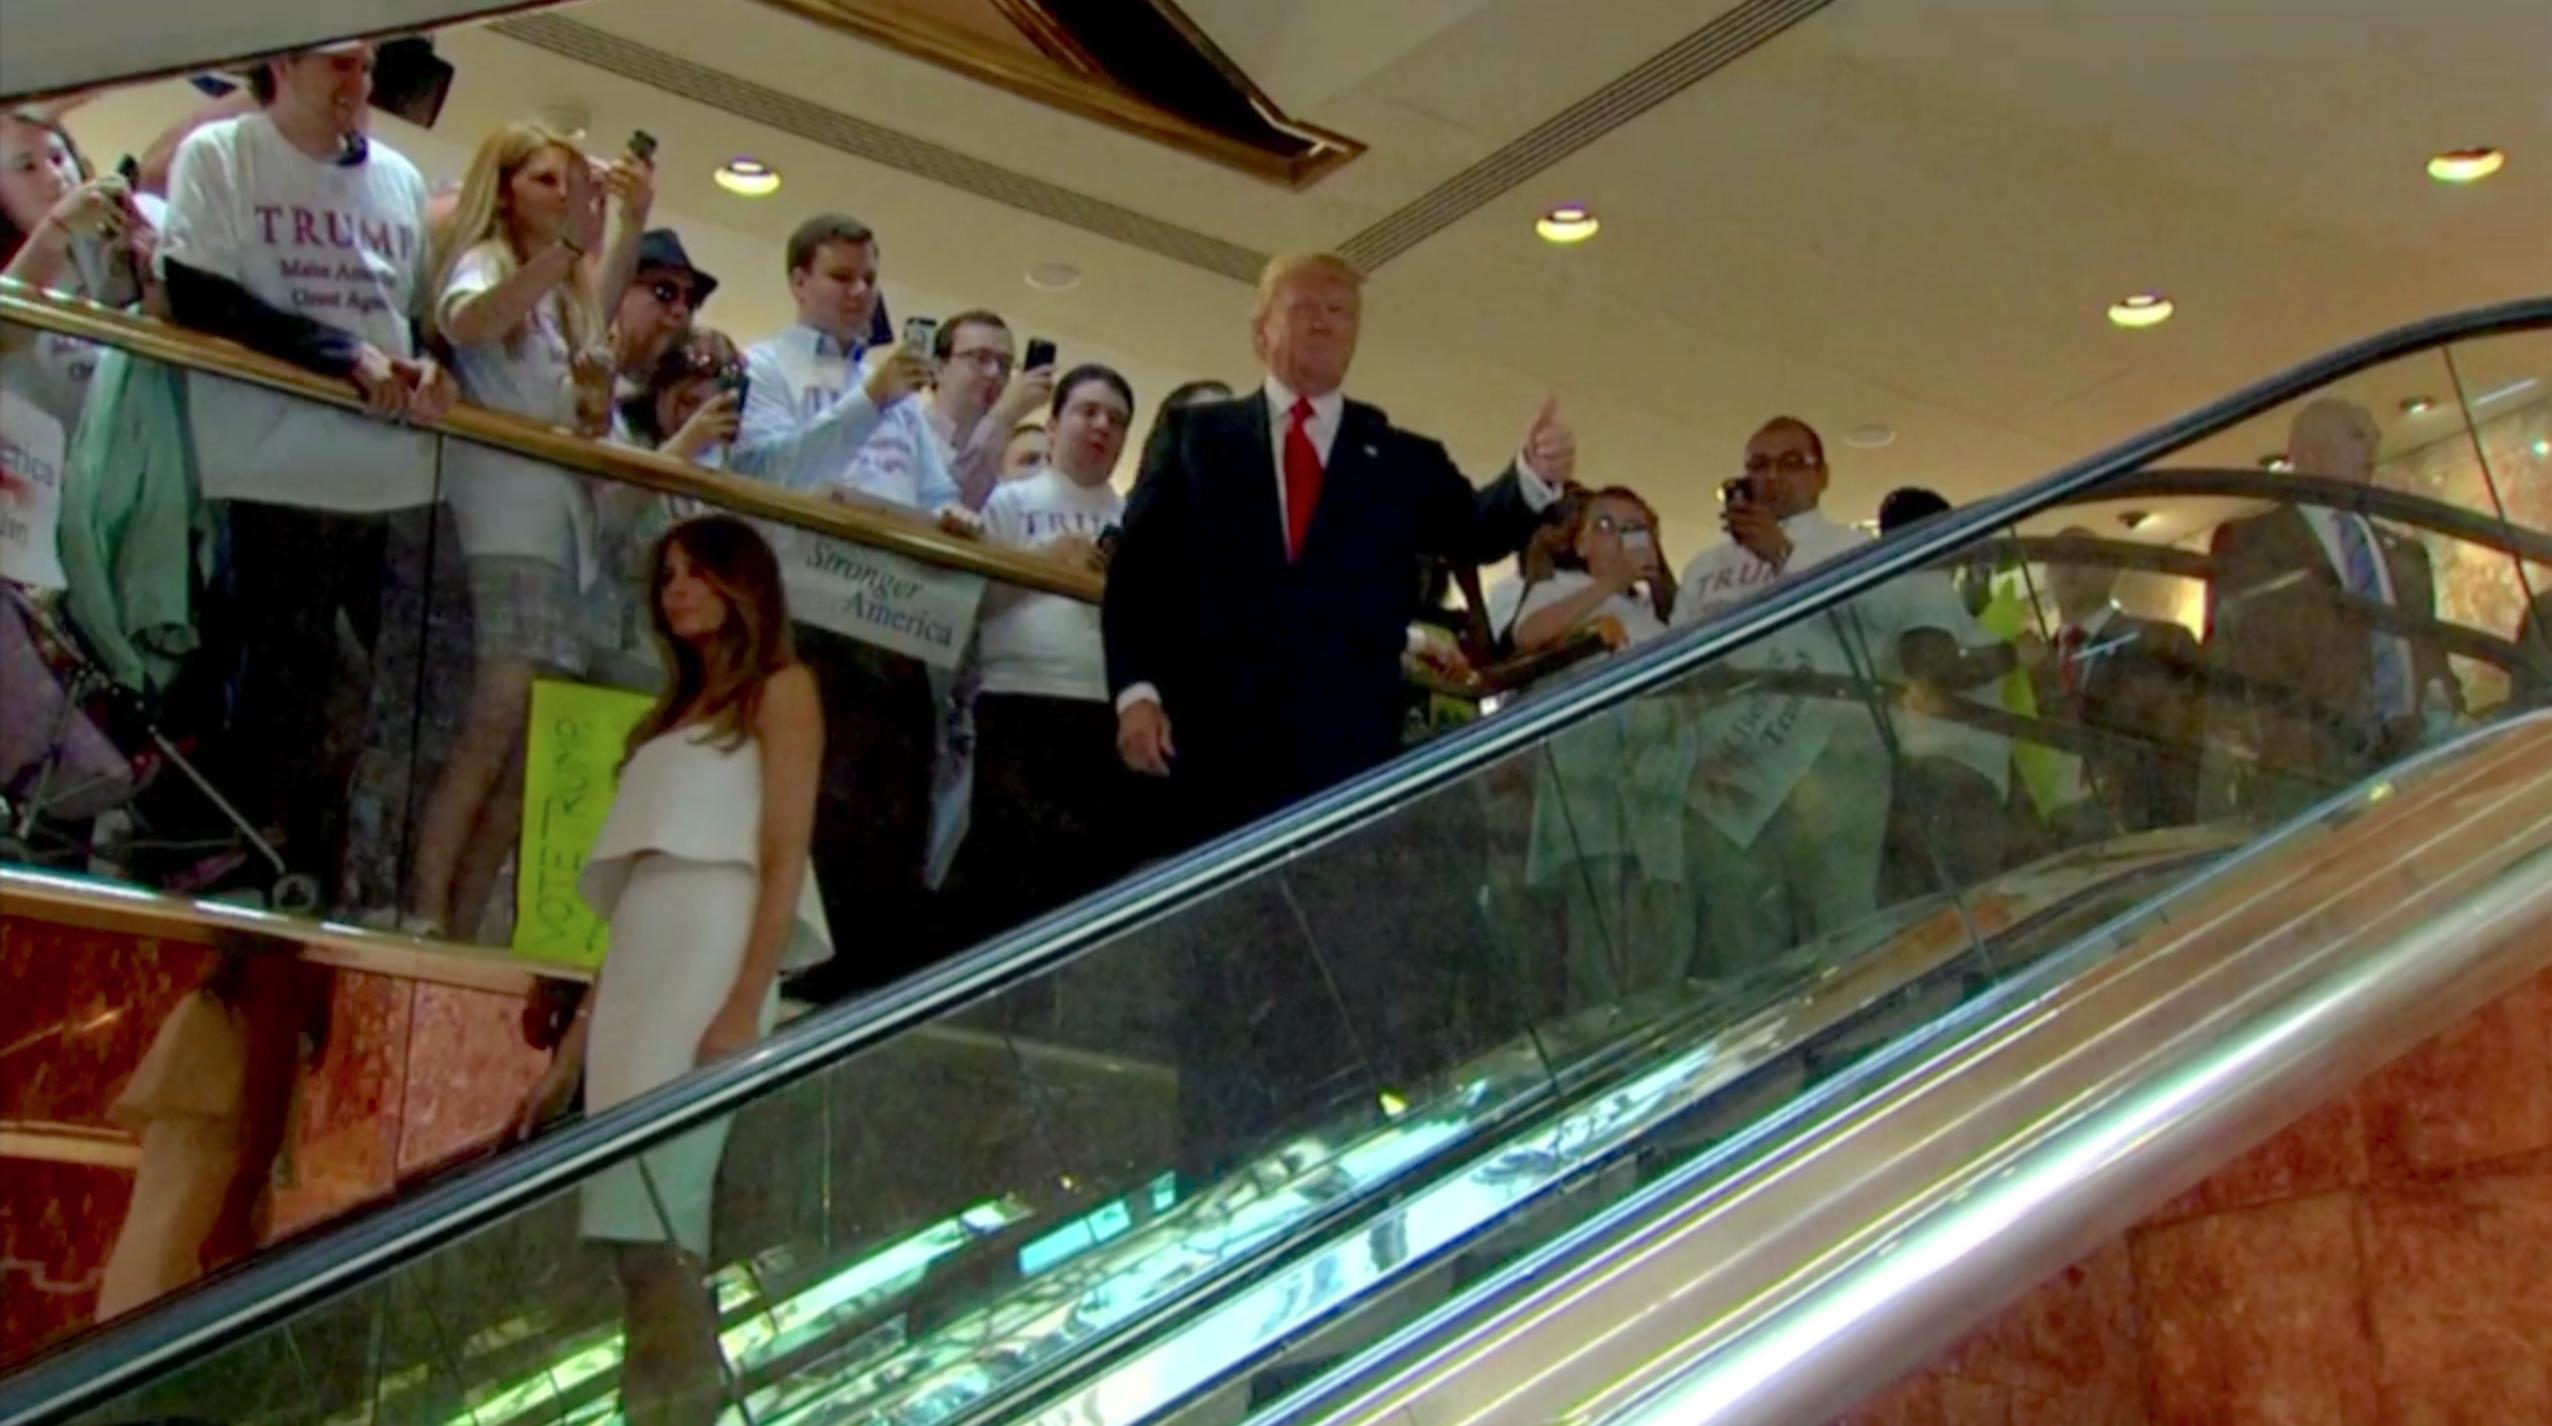 Donald Trump and Melania Trump in Trump: An American Dream (2017)